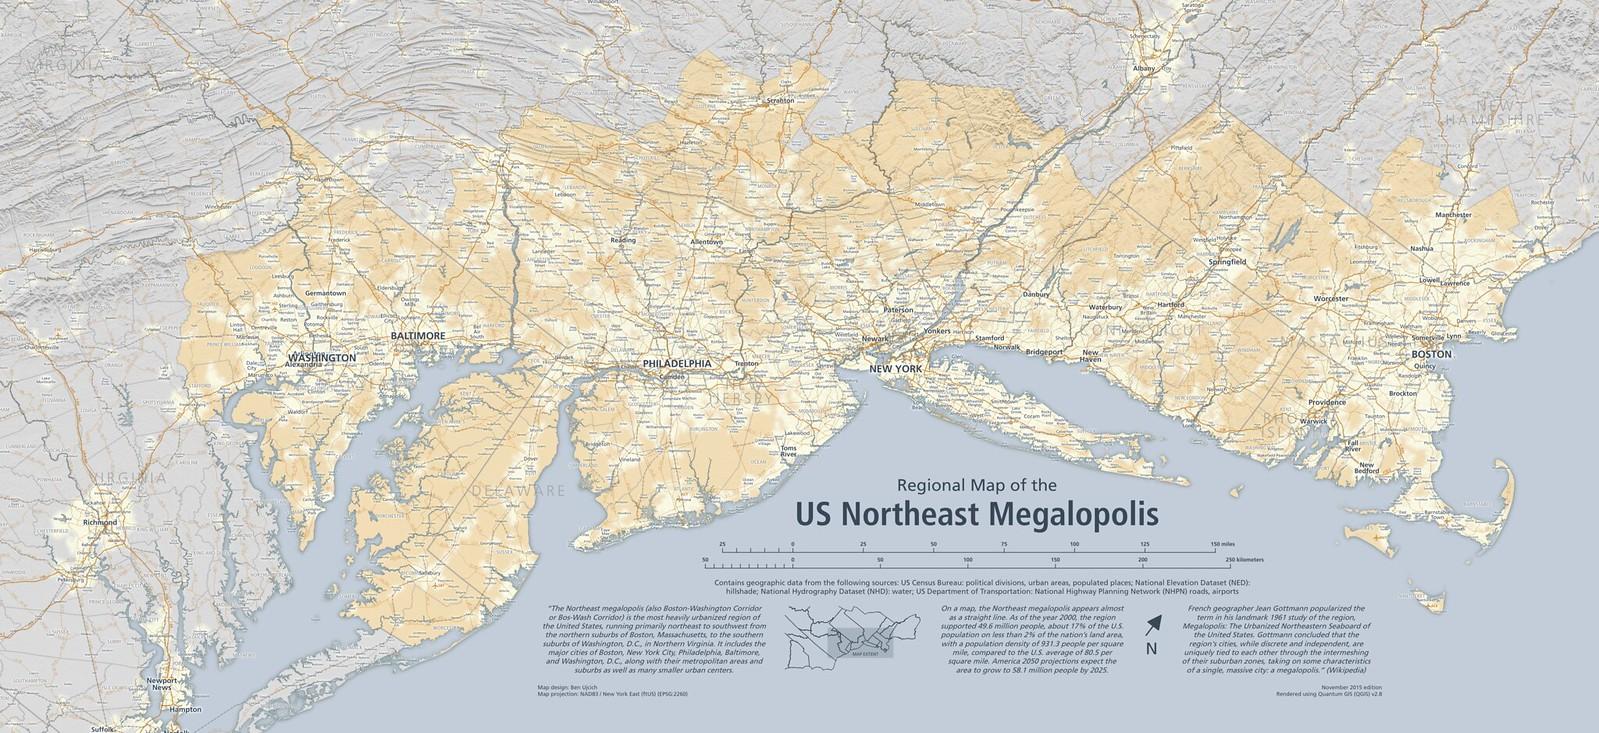 Regional Map of the US Northeast Megalopolis | A regional ma ...